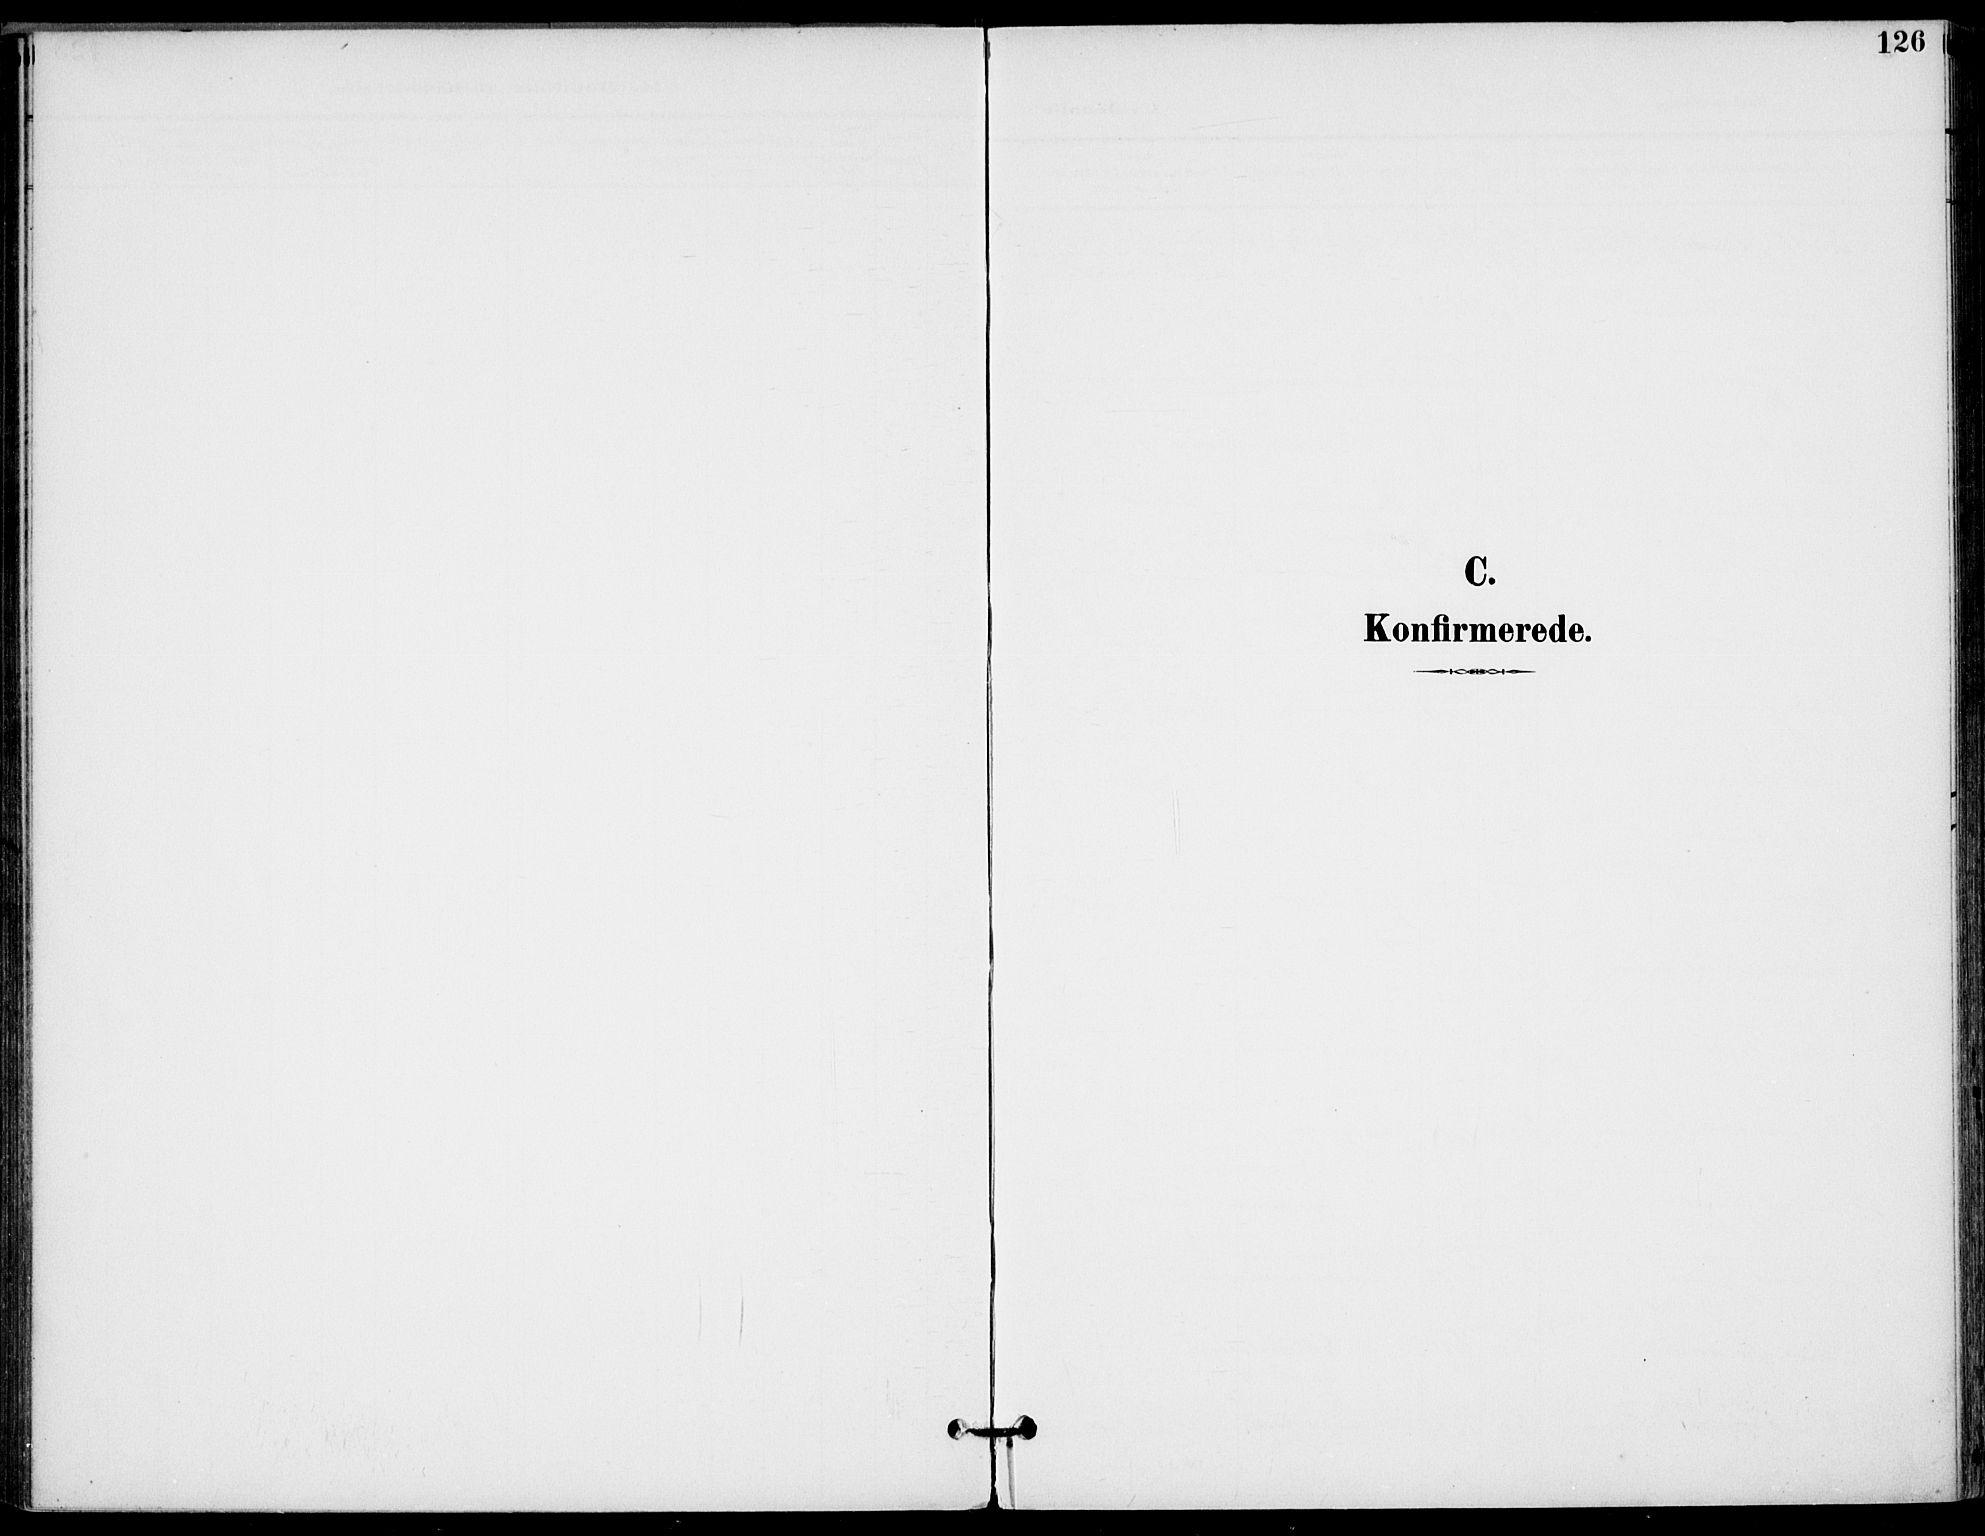 SAKO, Drangedal kirkebøker, F/Fa/L0012: Ministerialbok nr. 12, 1895-1905, s. 126